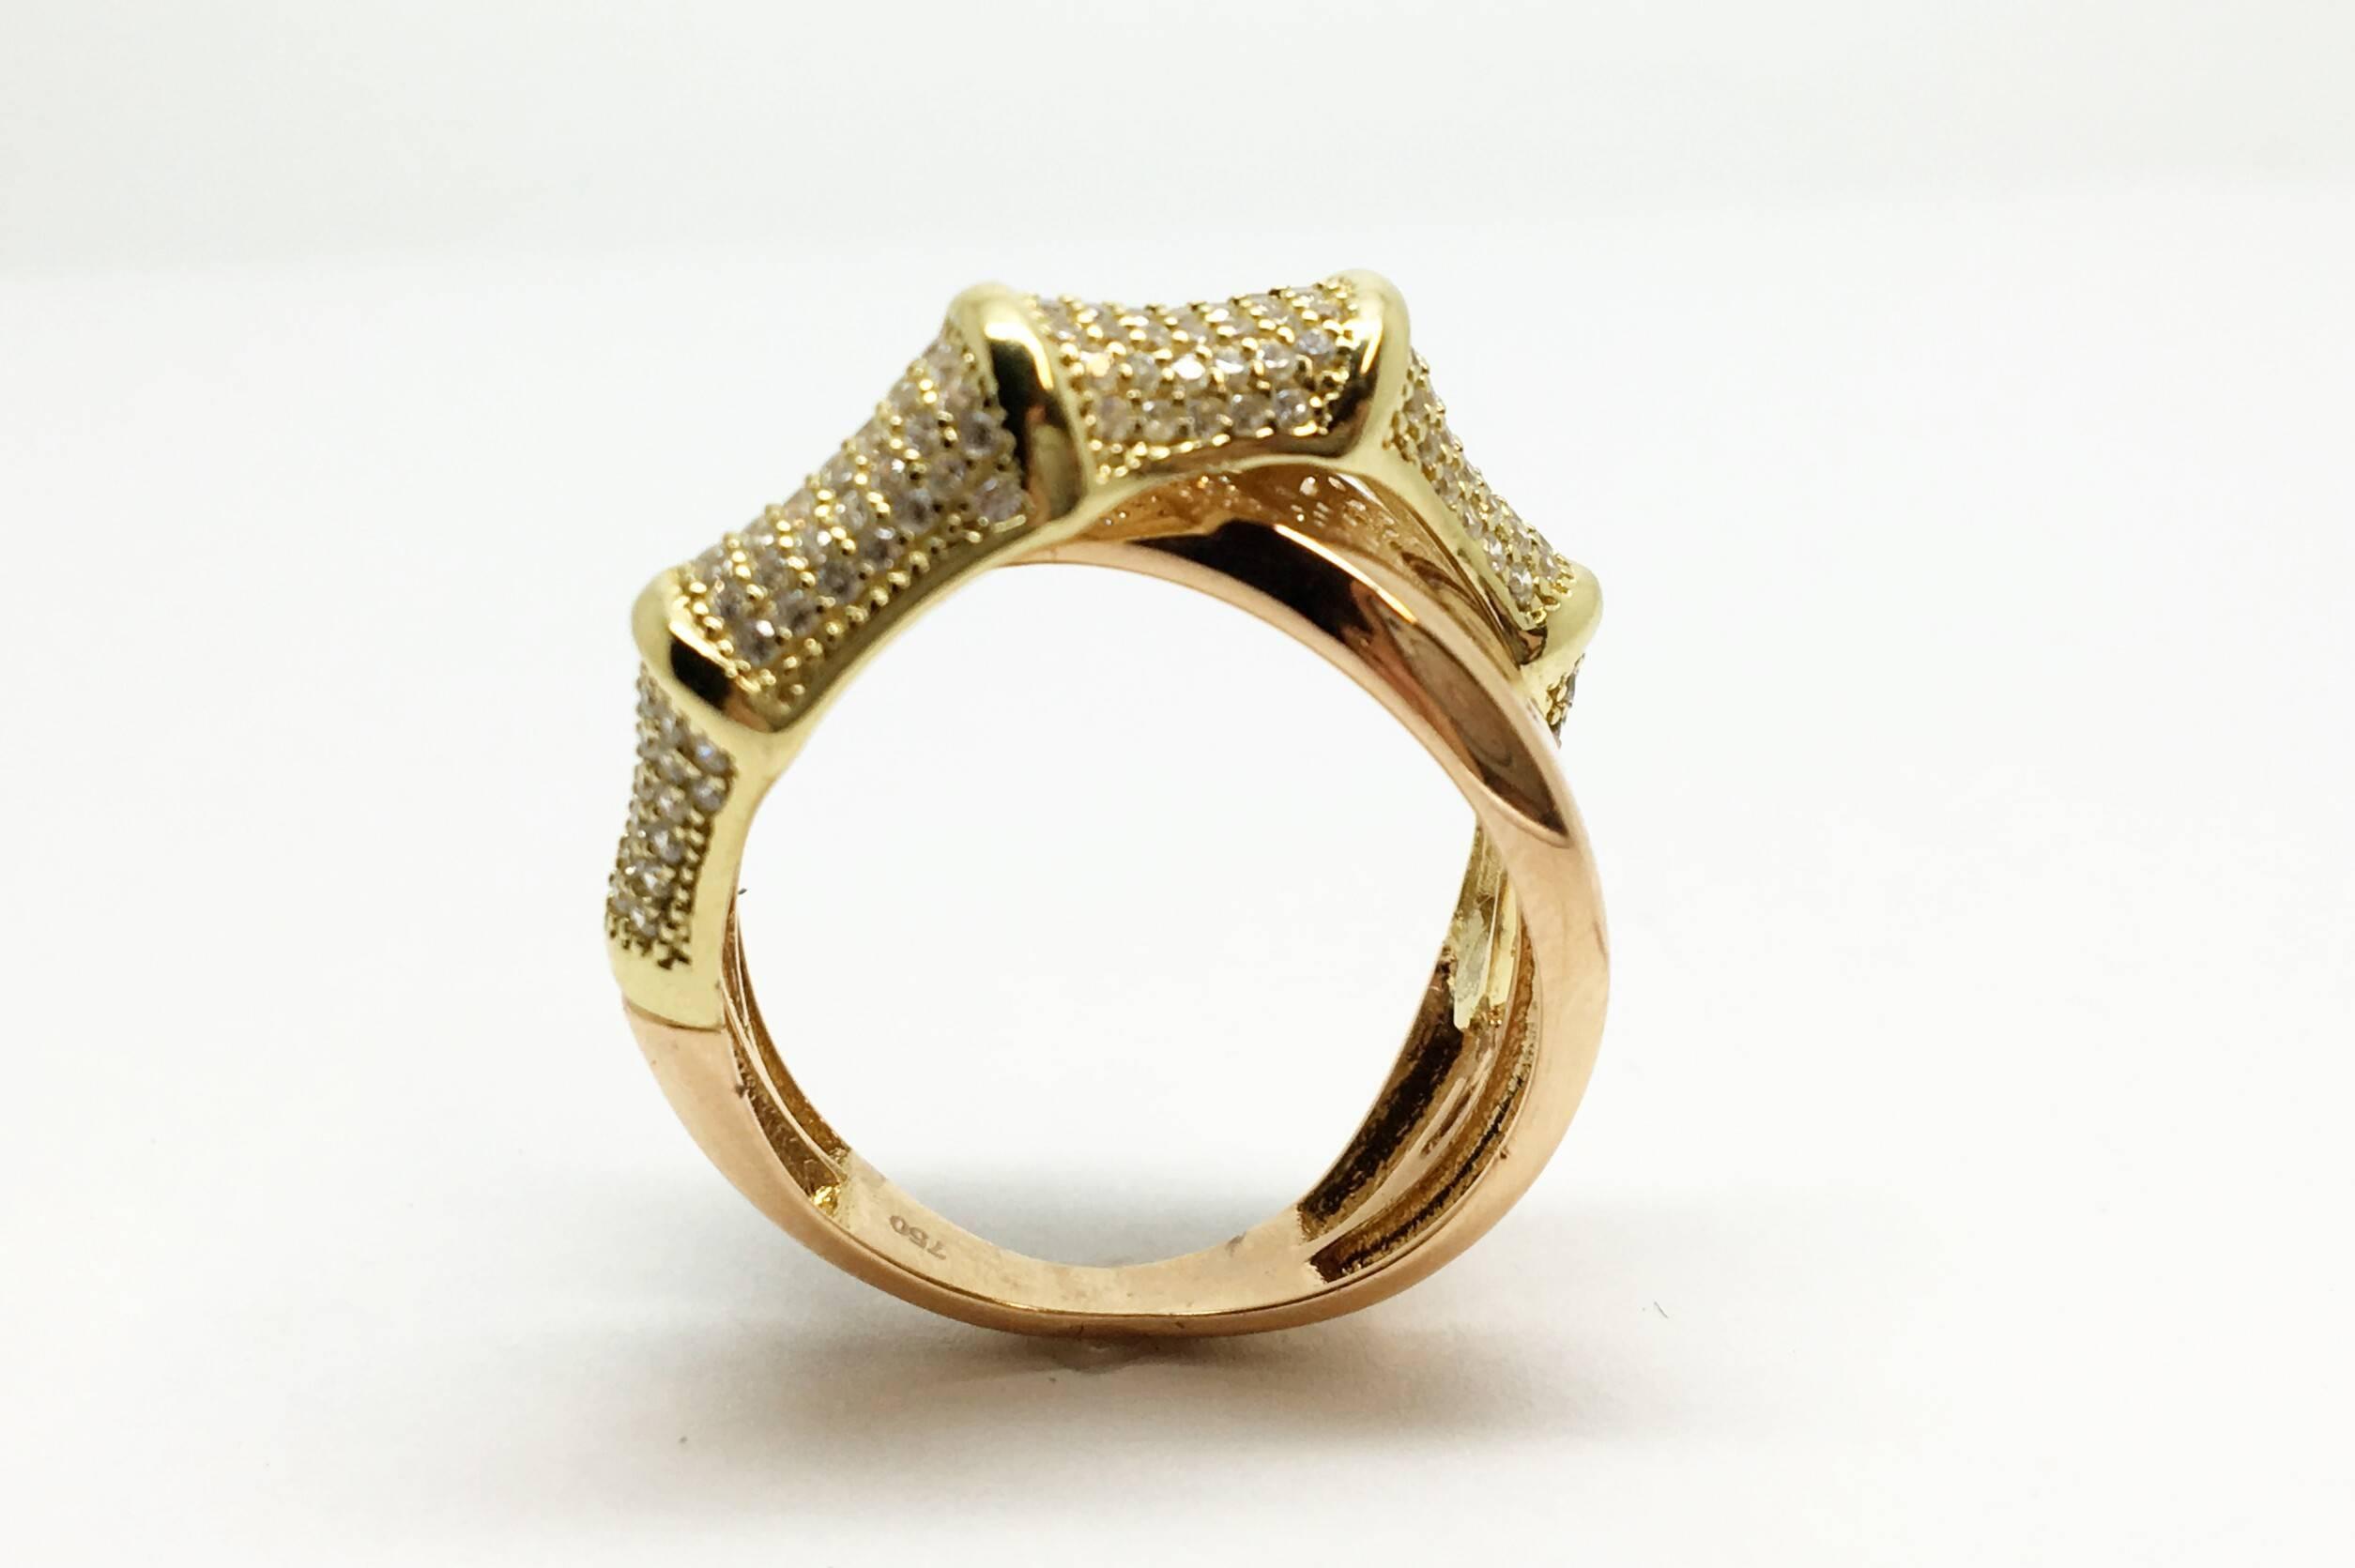 Sortija oro oro rosa Joyería Juan Luis Larráyoz comprar online anillo joyería online